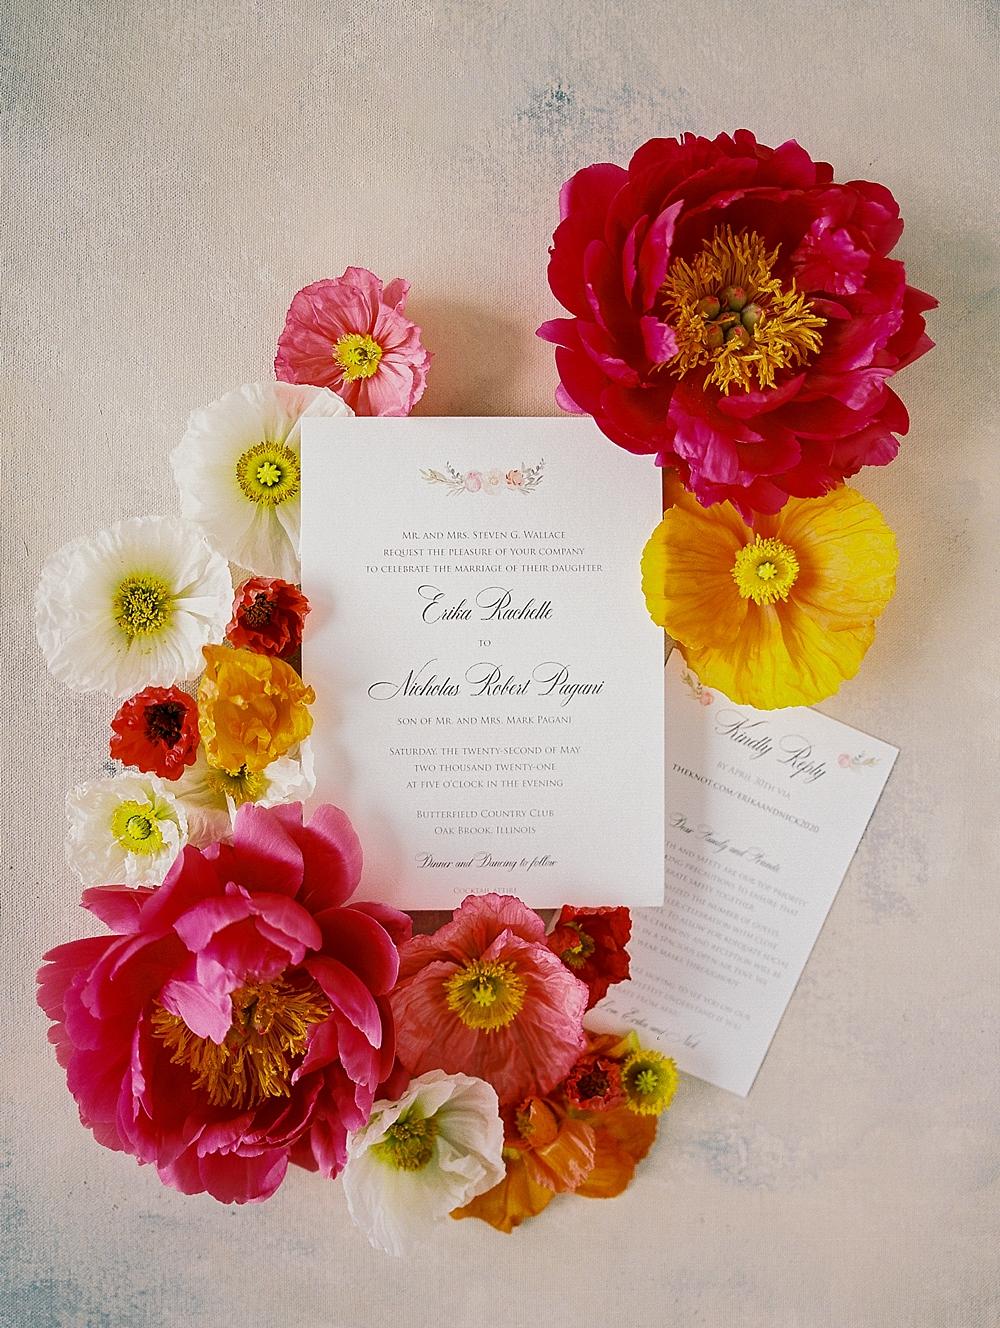 kristin-la-voie-photography-butterfield-country-club-best-chicago-austin-wedding-fine-art-photographer-5